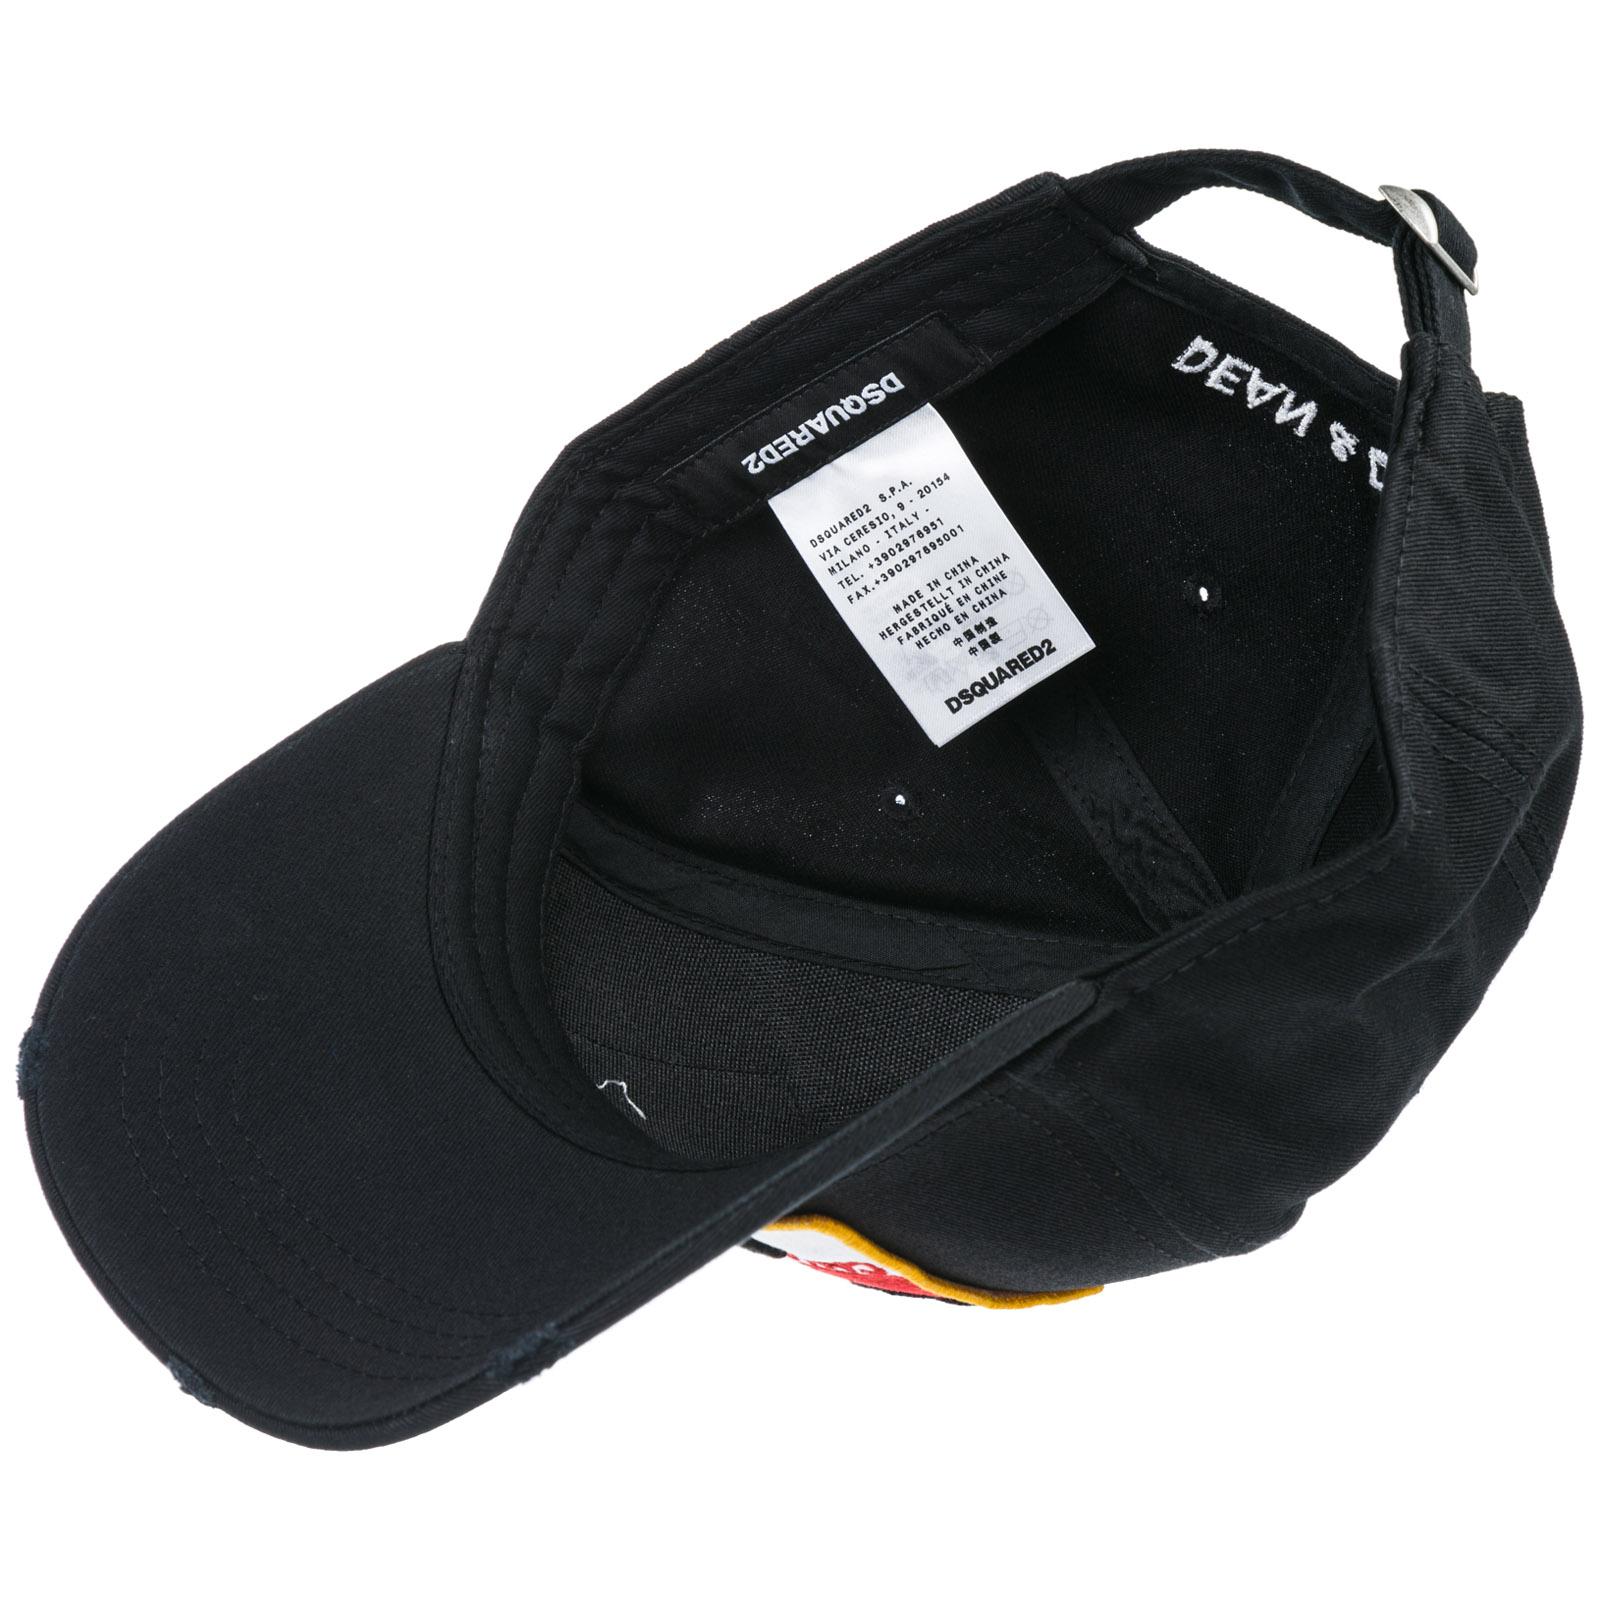 Adjustable men's cotton hat baseball cap  twins